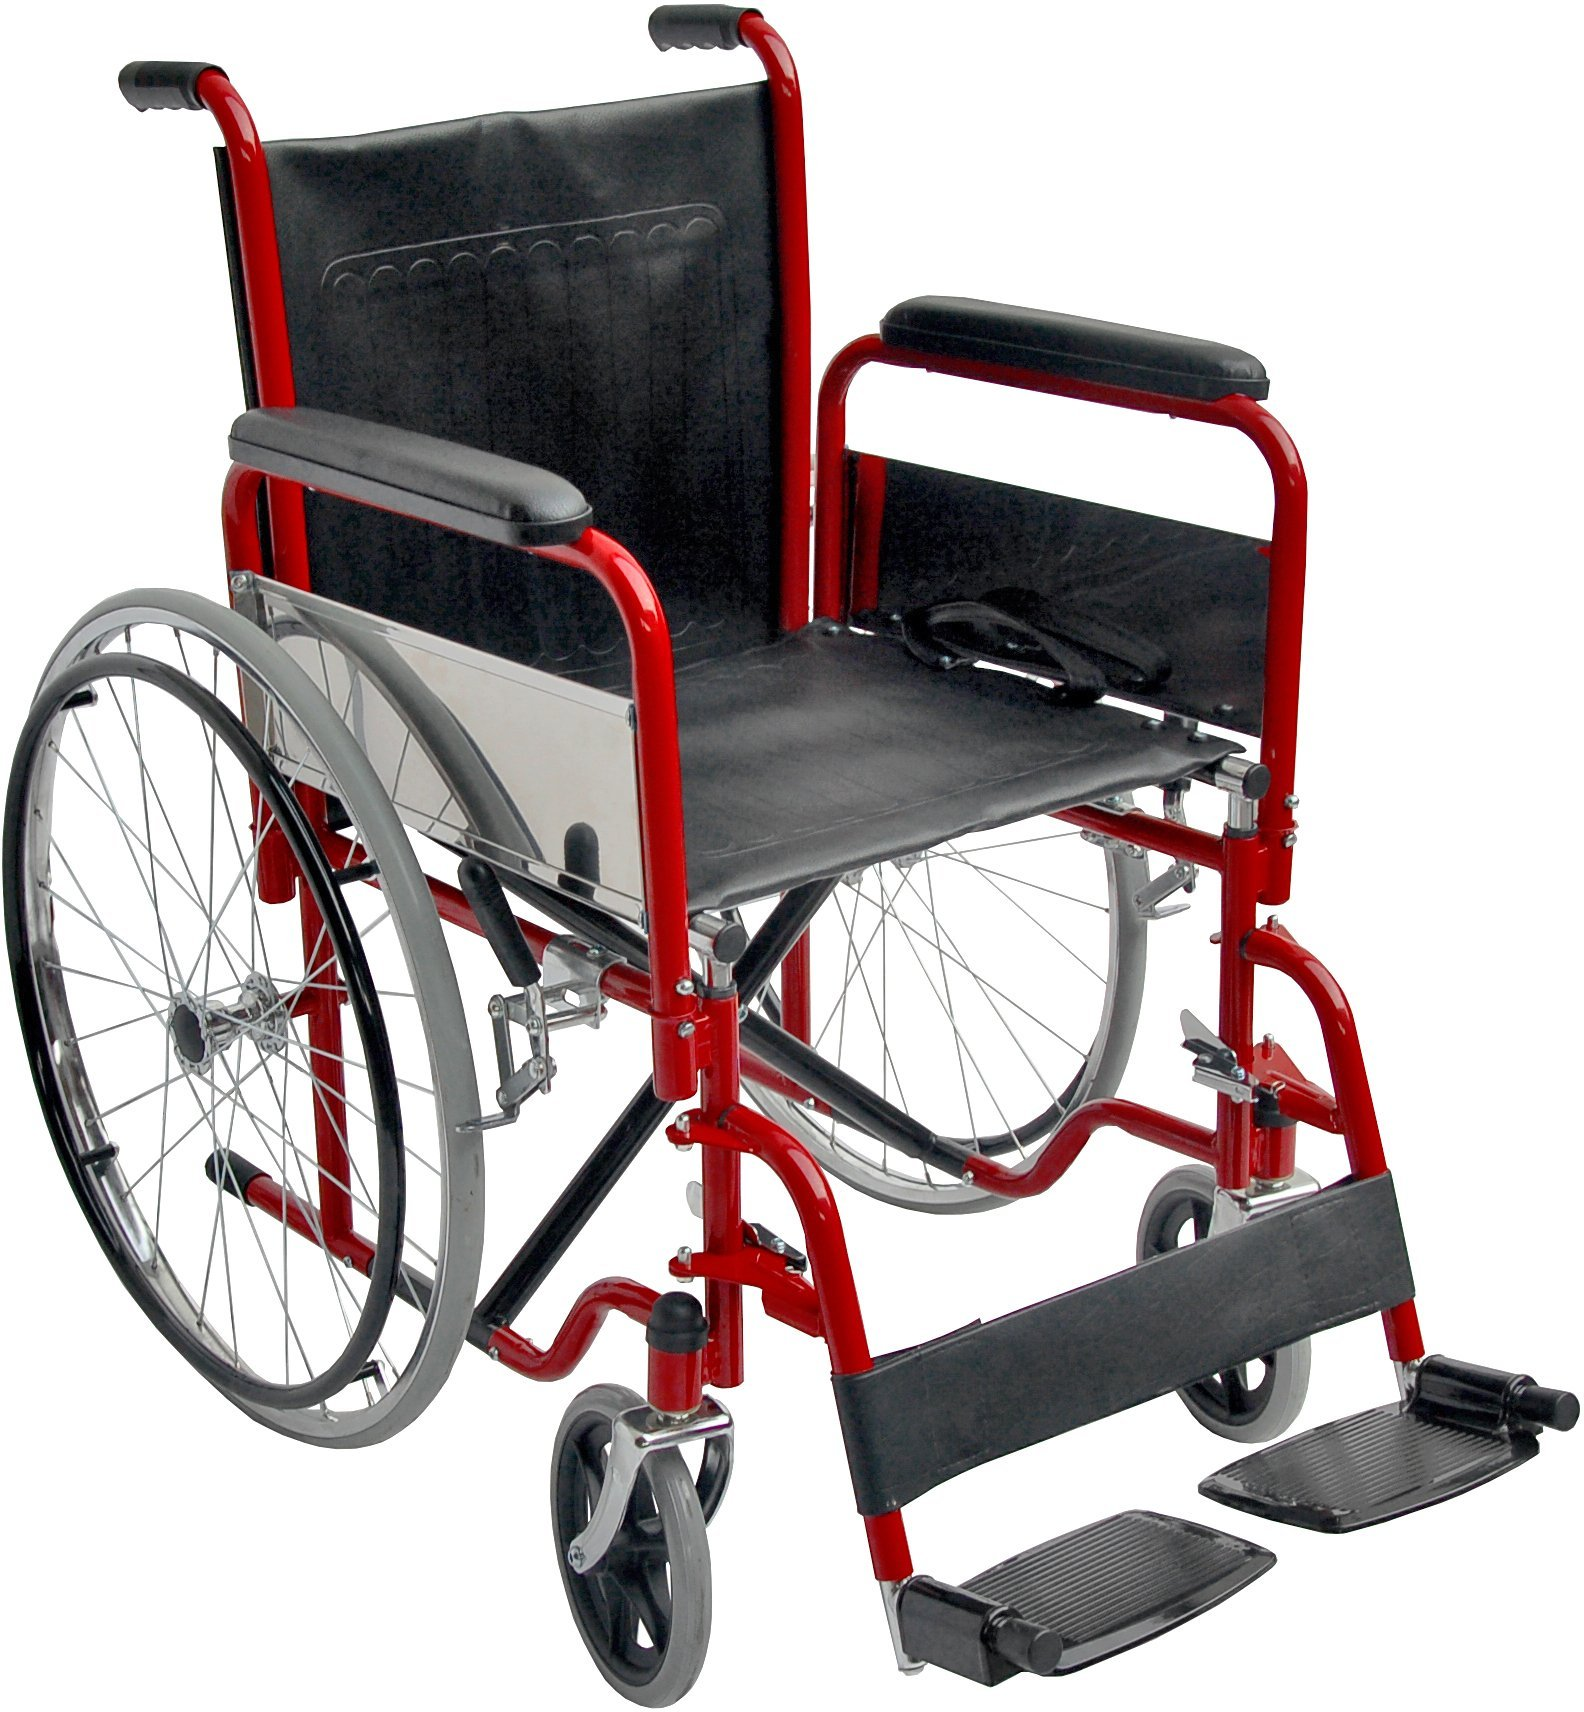 Accela Folding Wheelchair